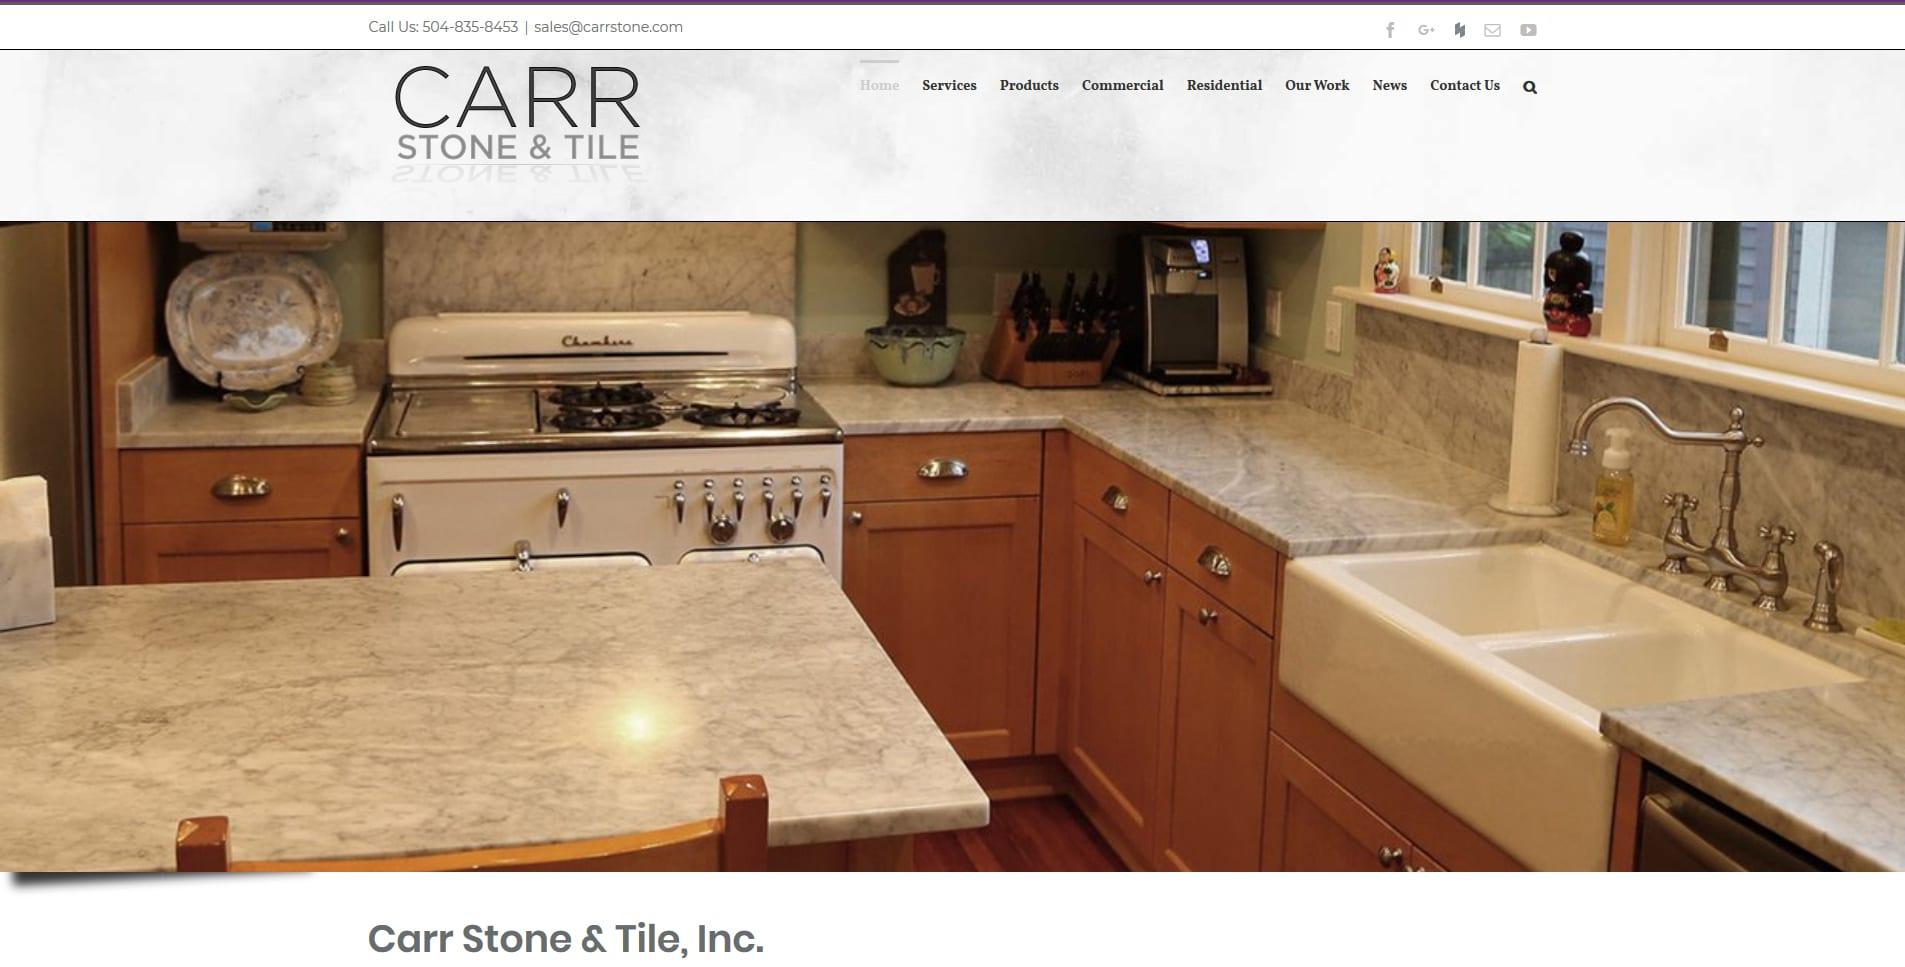 Carr Stone & Tile, Inc.